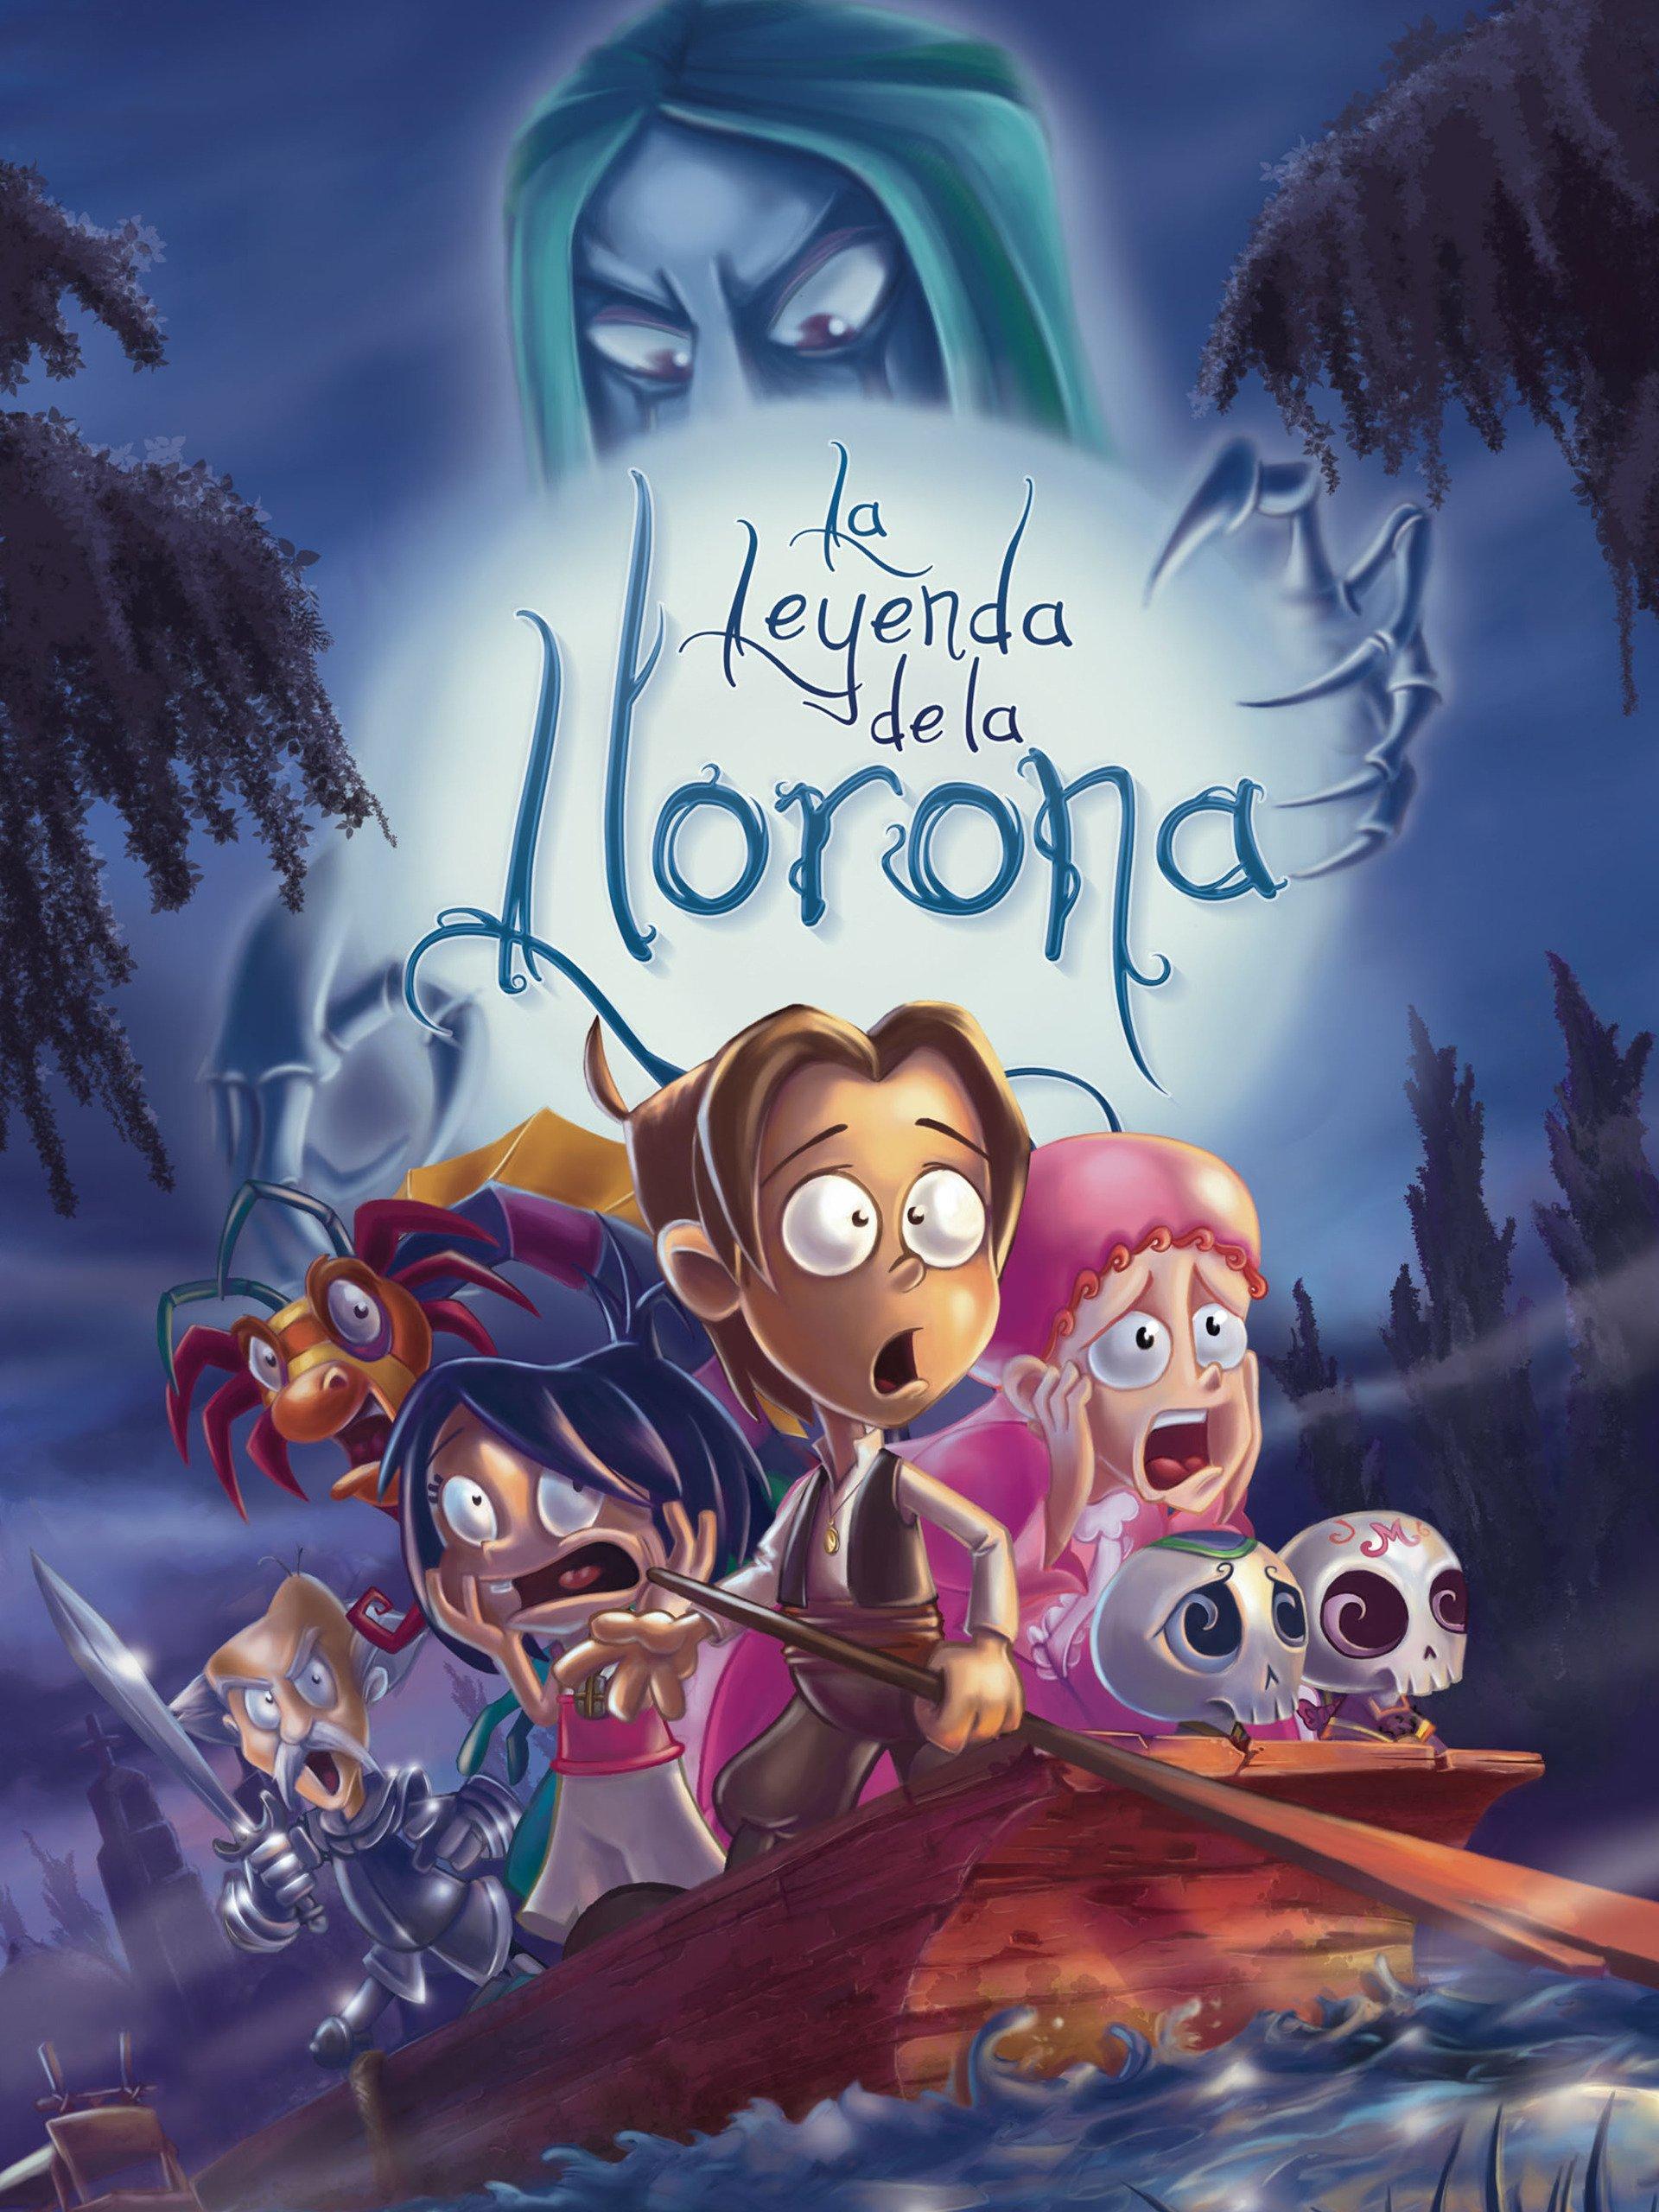 snap la llorona folklore villains wiki fandom powered by